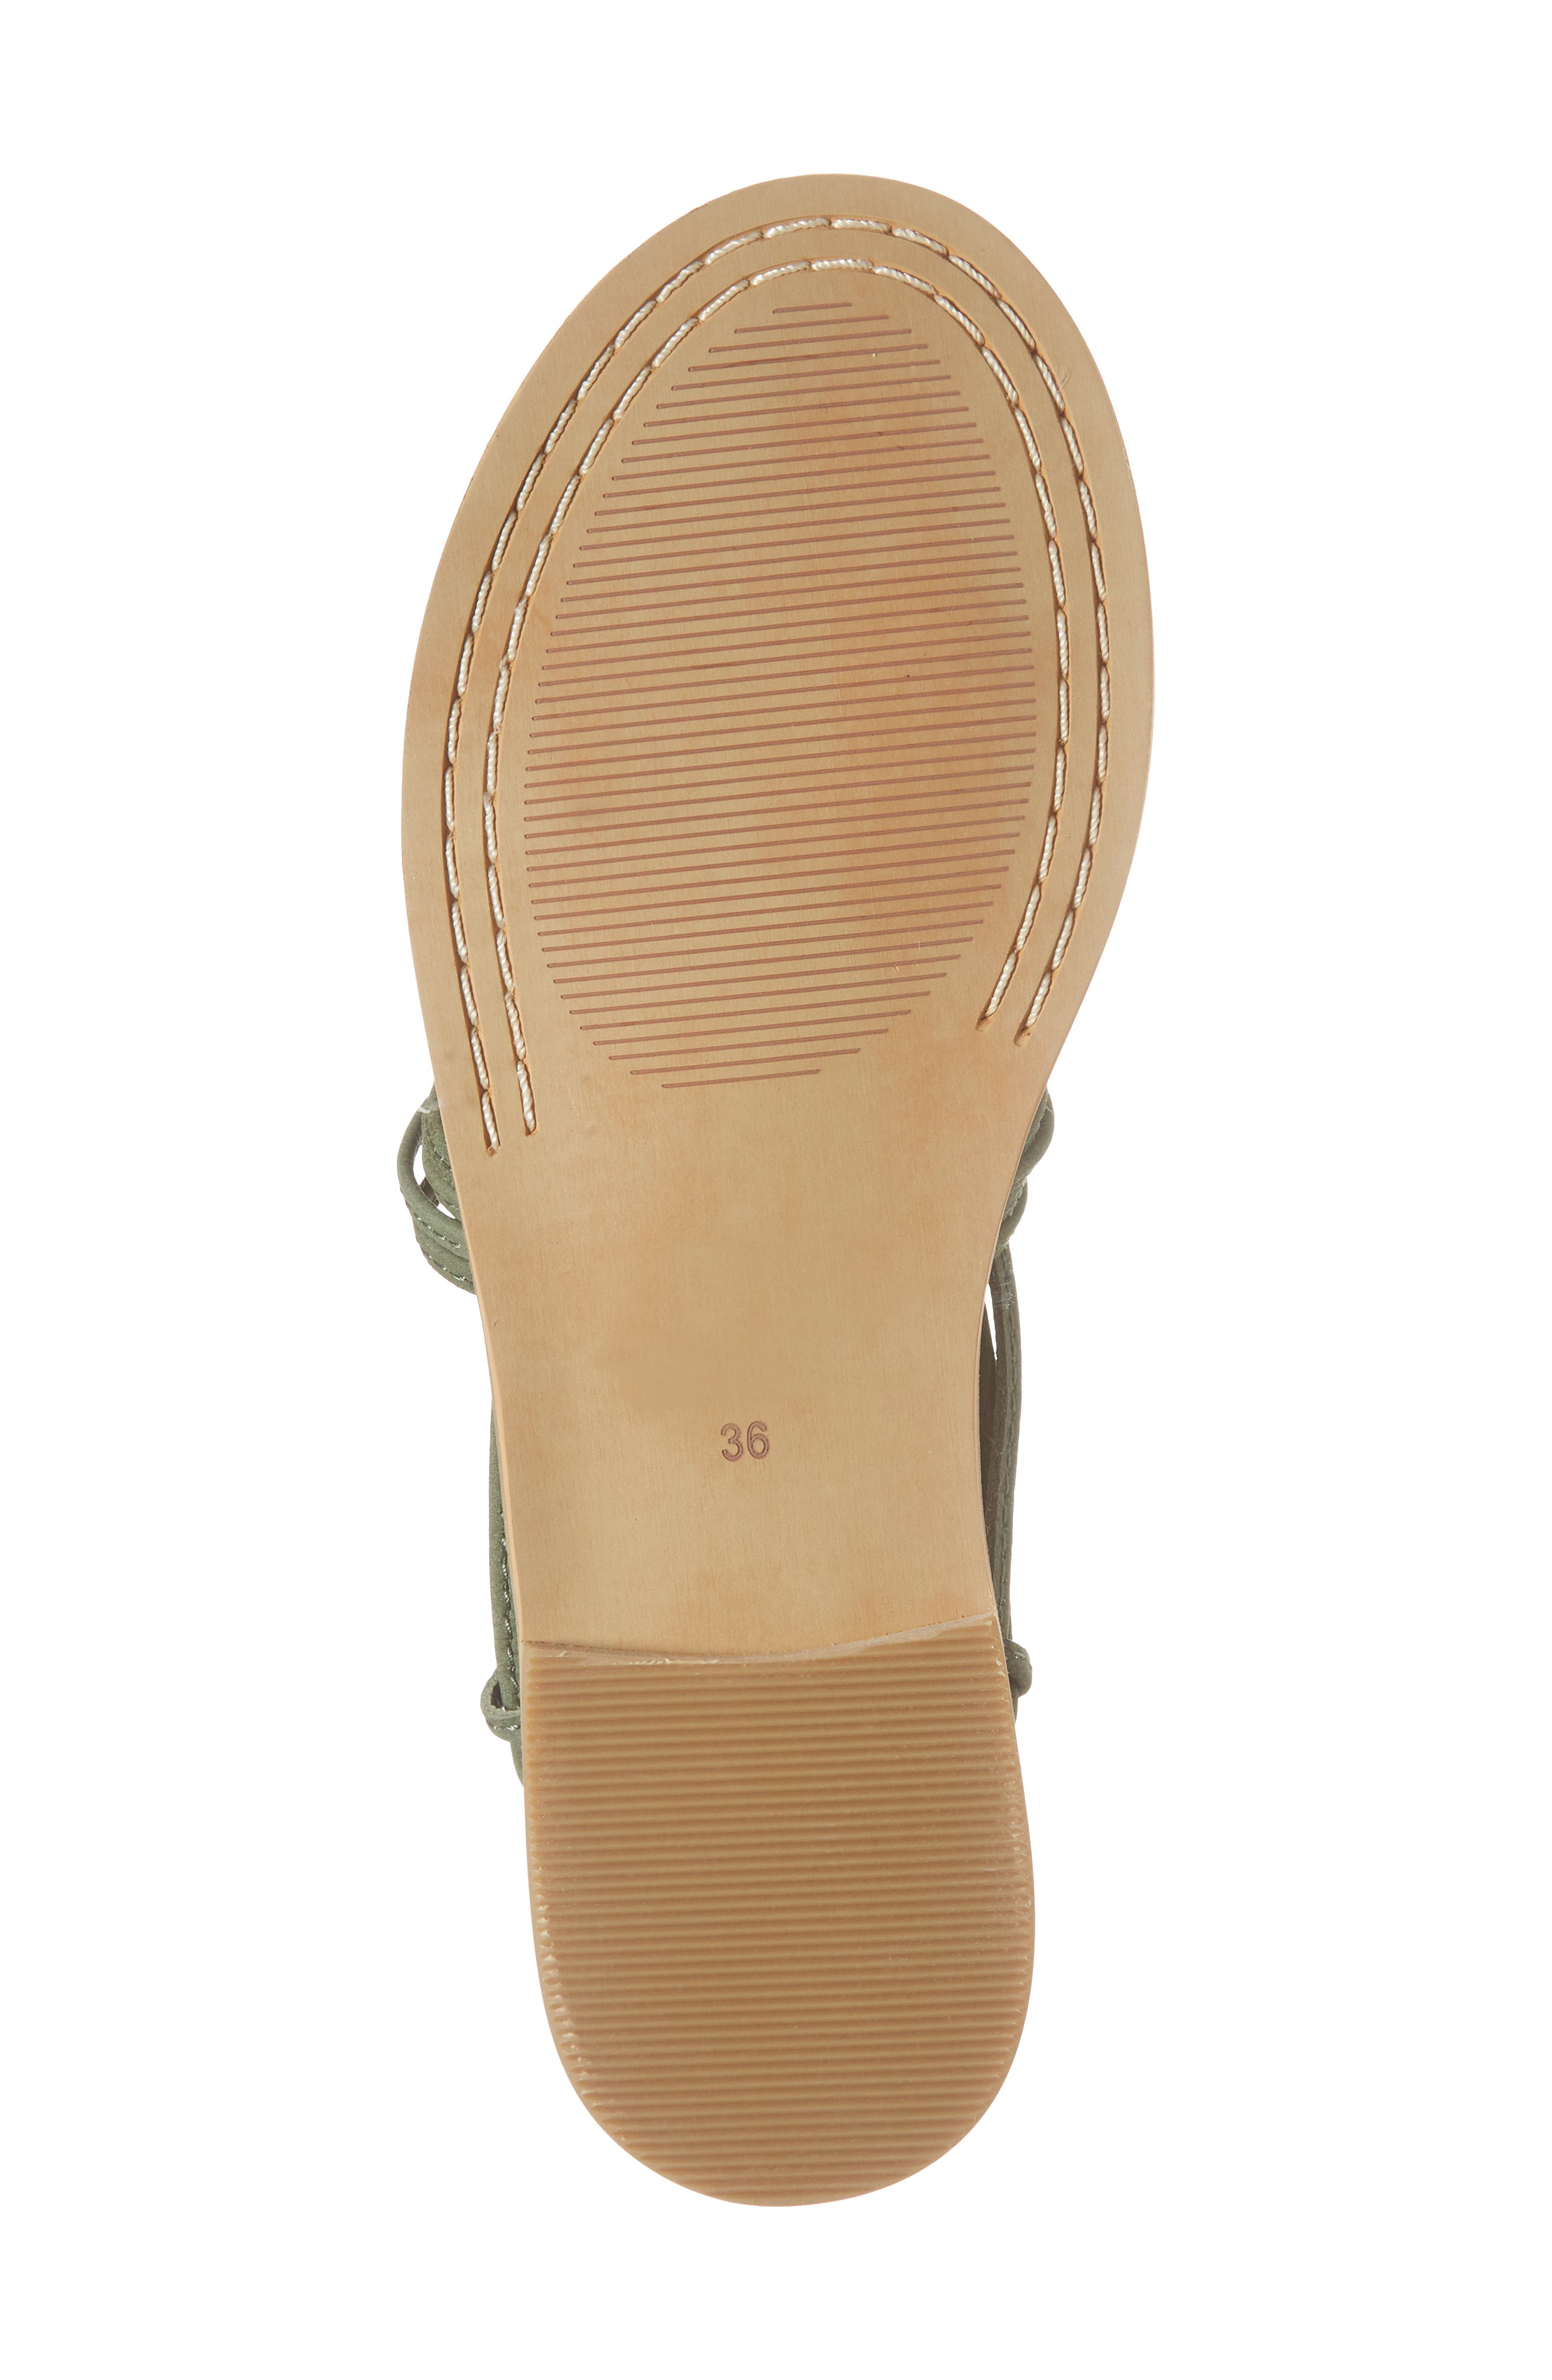 Theory Strappy Flat Sandal,                             Alternate thumbnail 6, color,                             Khaki Leather